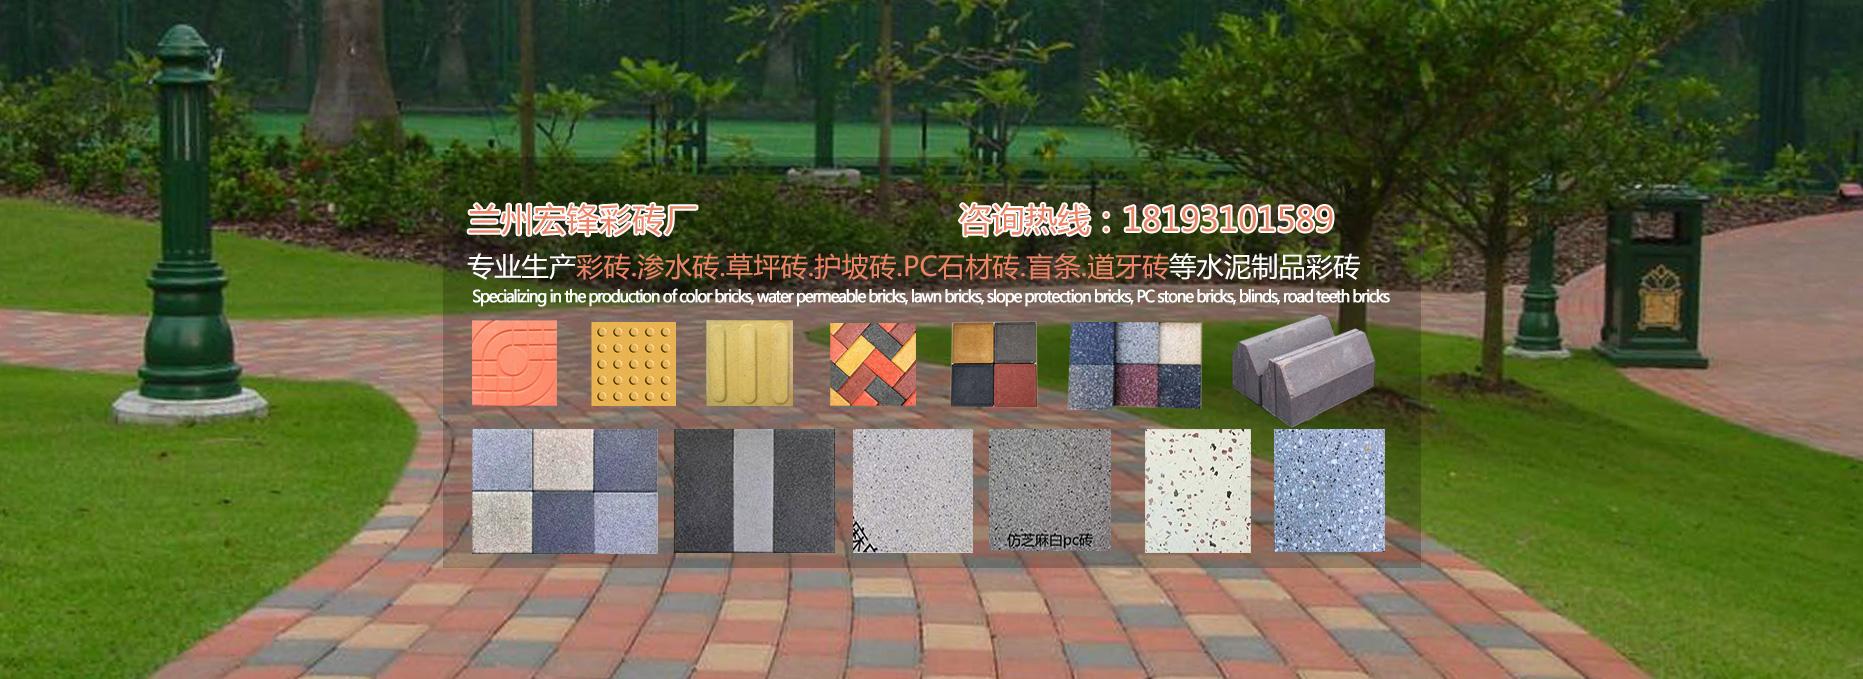 http://www.lzhongfeng.com/data/upload/202005/20200528144331_807.jpg